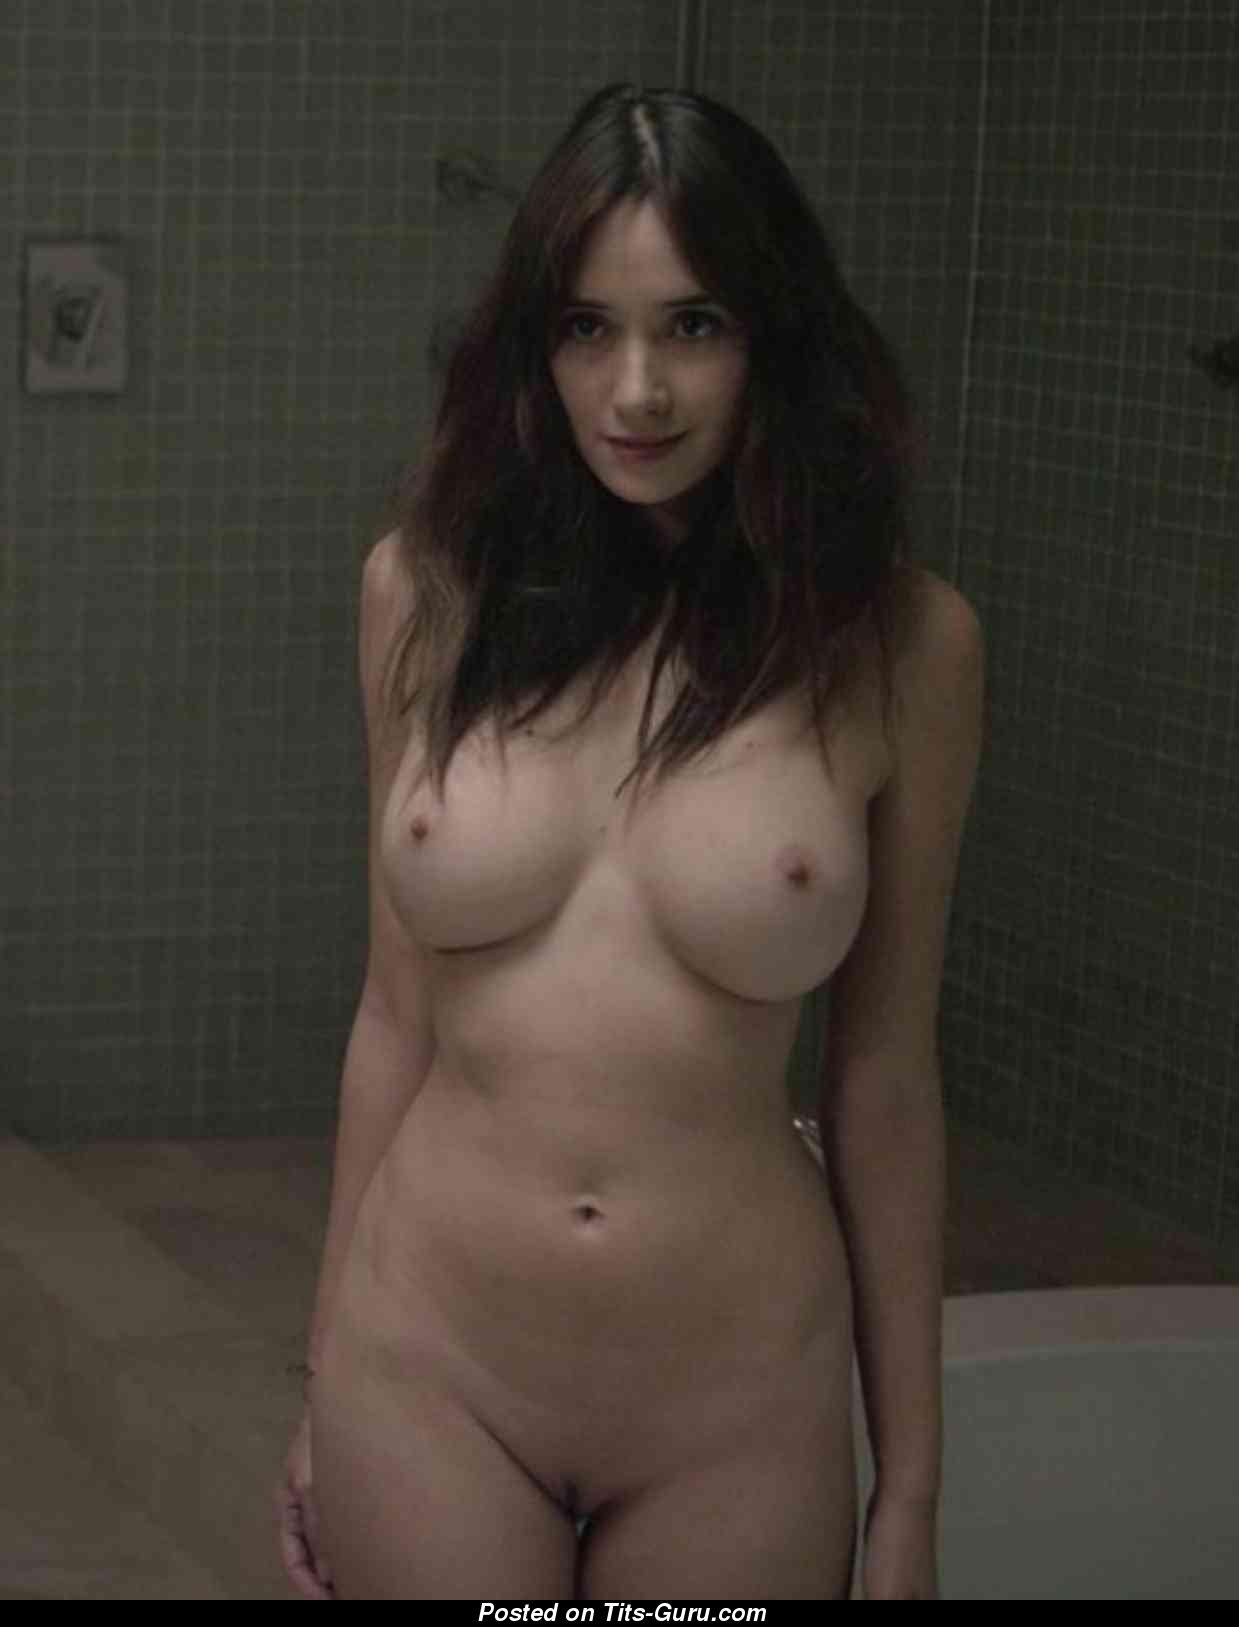 Porno Sara Malakul Lane nudes (36 foto and video), Tits, Paparazzi, Boobs, lingerie 2018